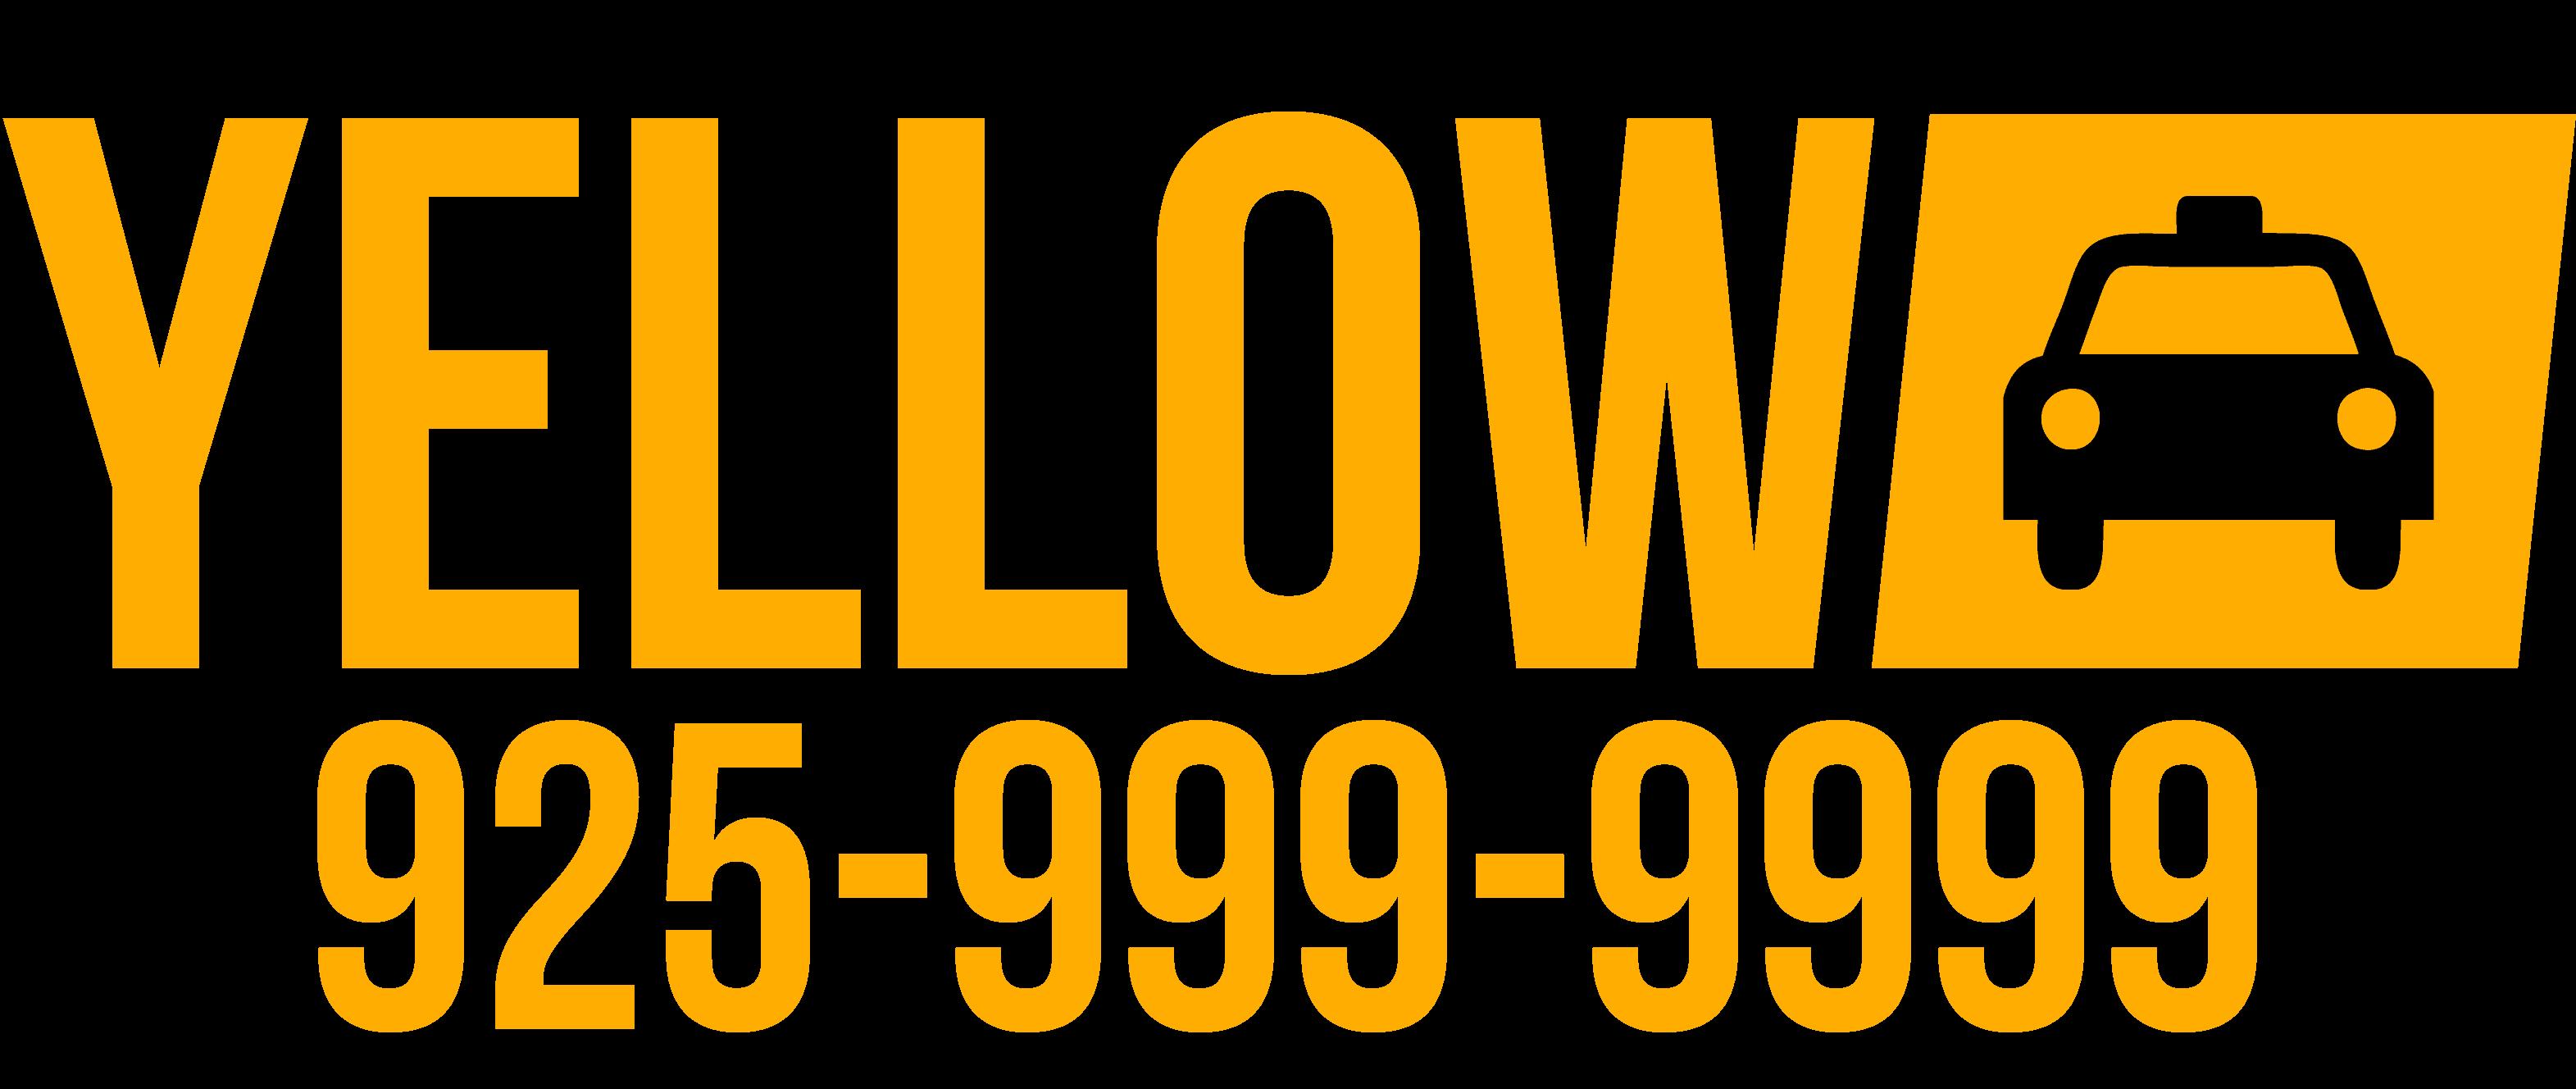 Yellow Cab Tri-Valley - Tri-Valley's Premier Taxi Service - 9259999999